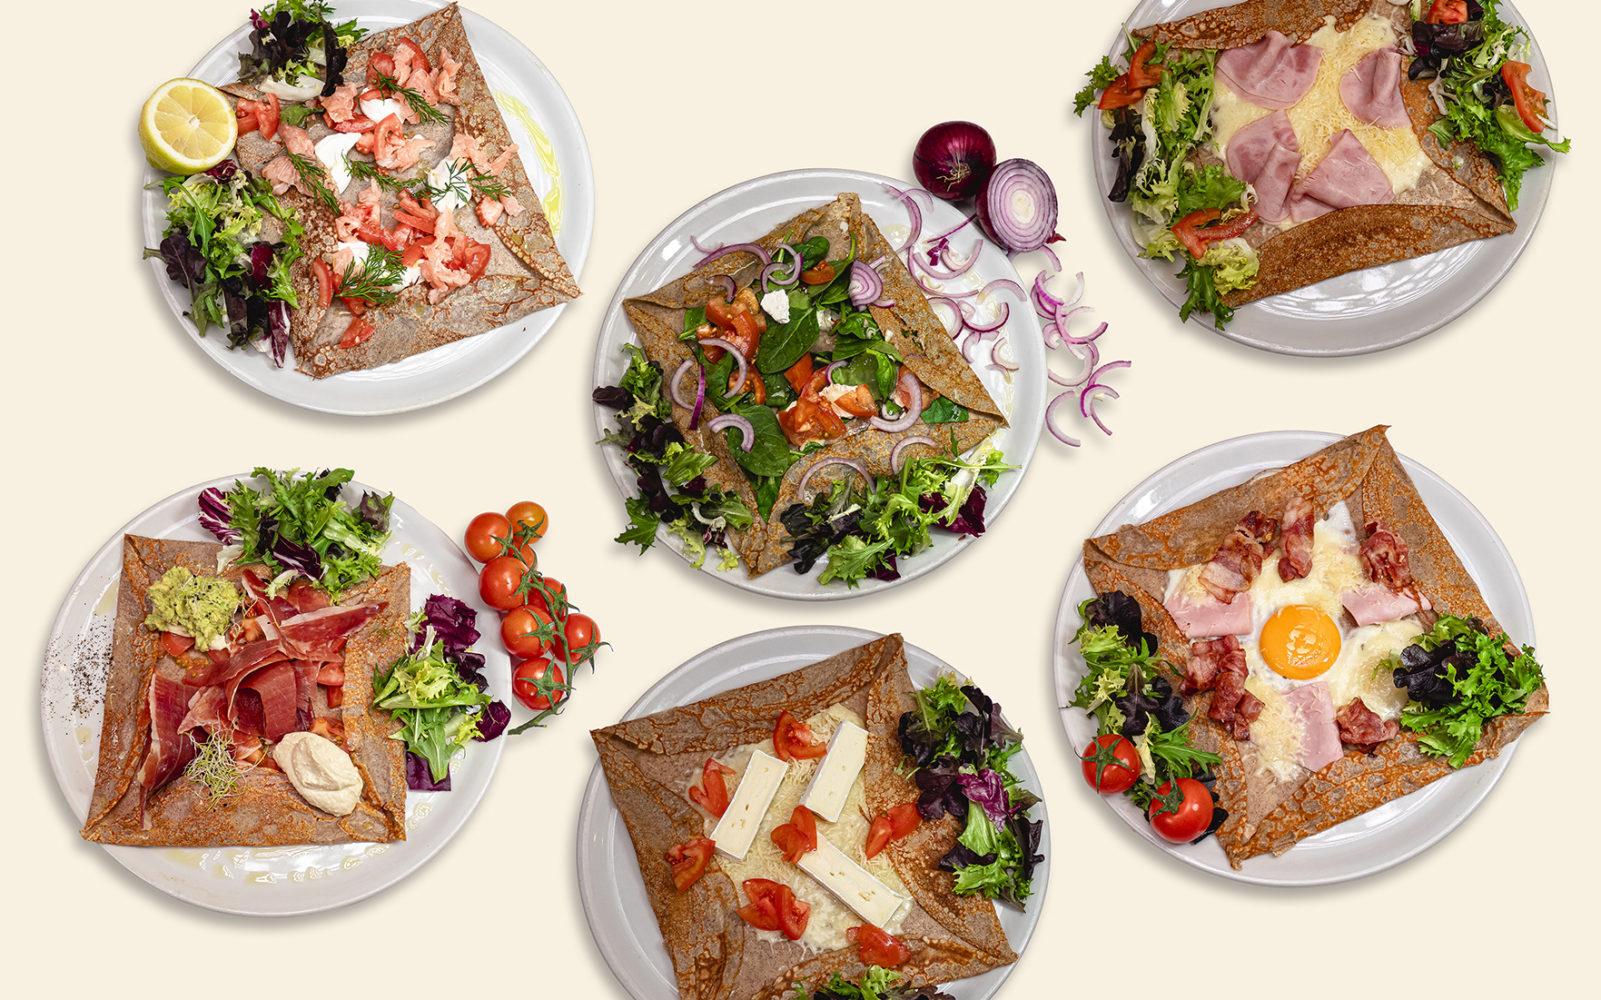 galettes bretonne sevilla crepes saladas en sevilla